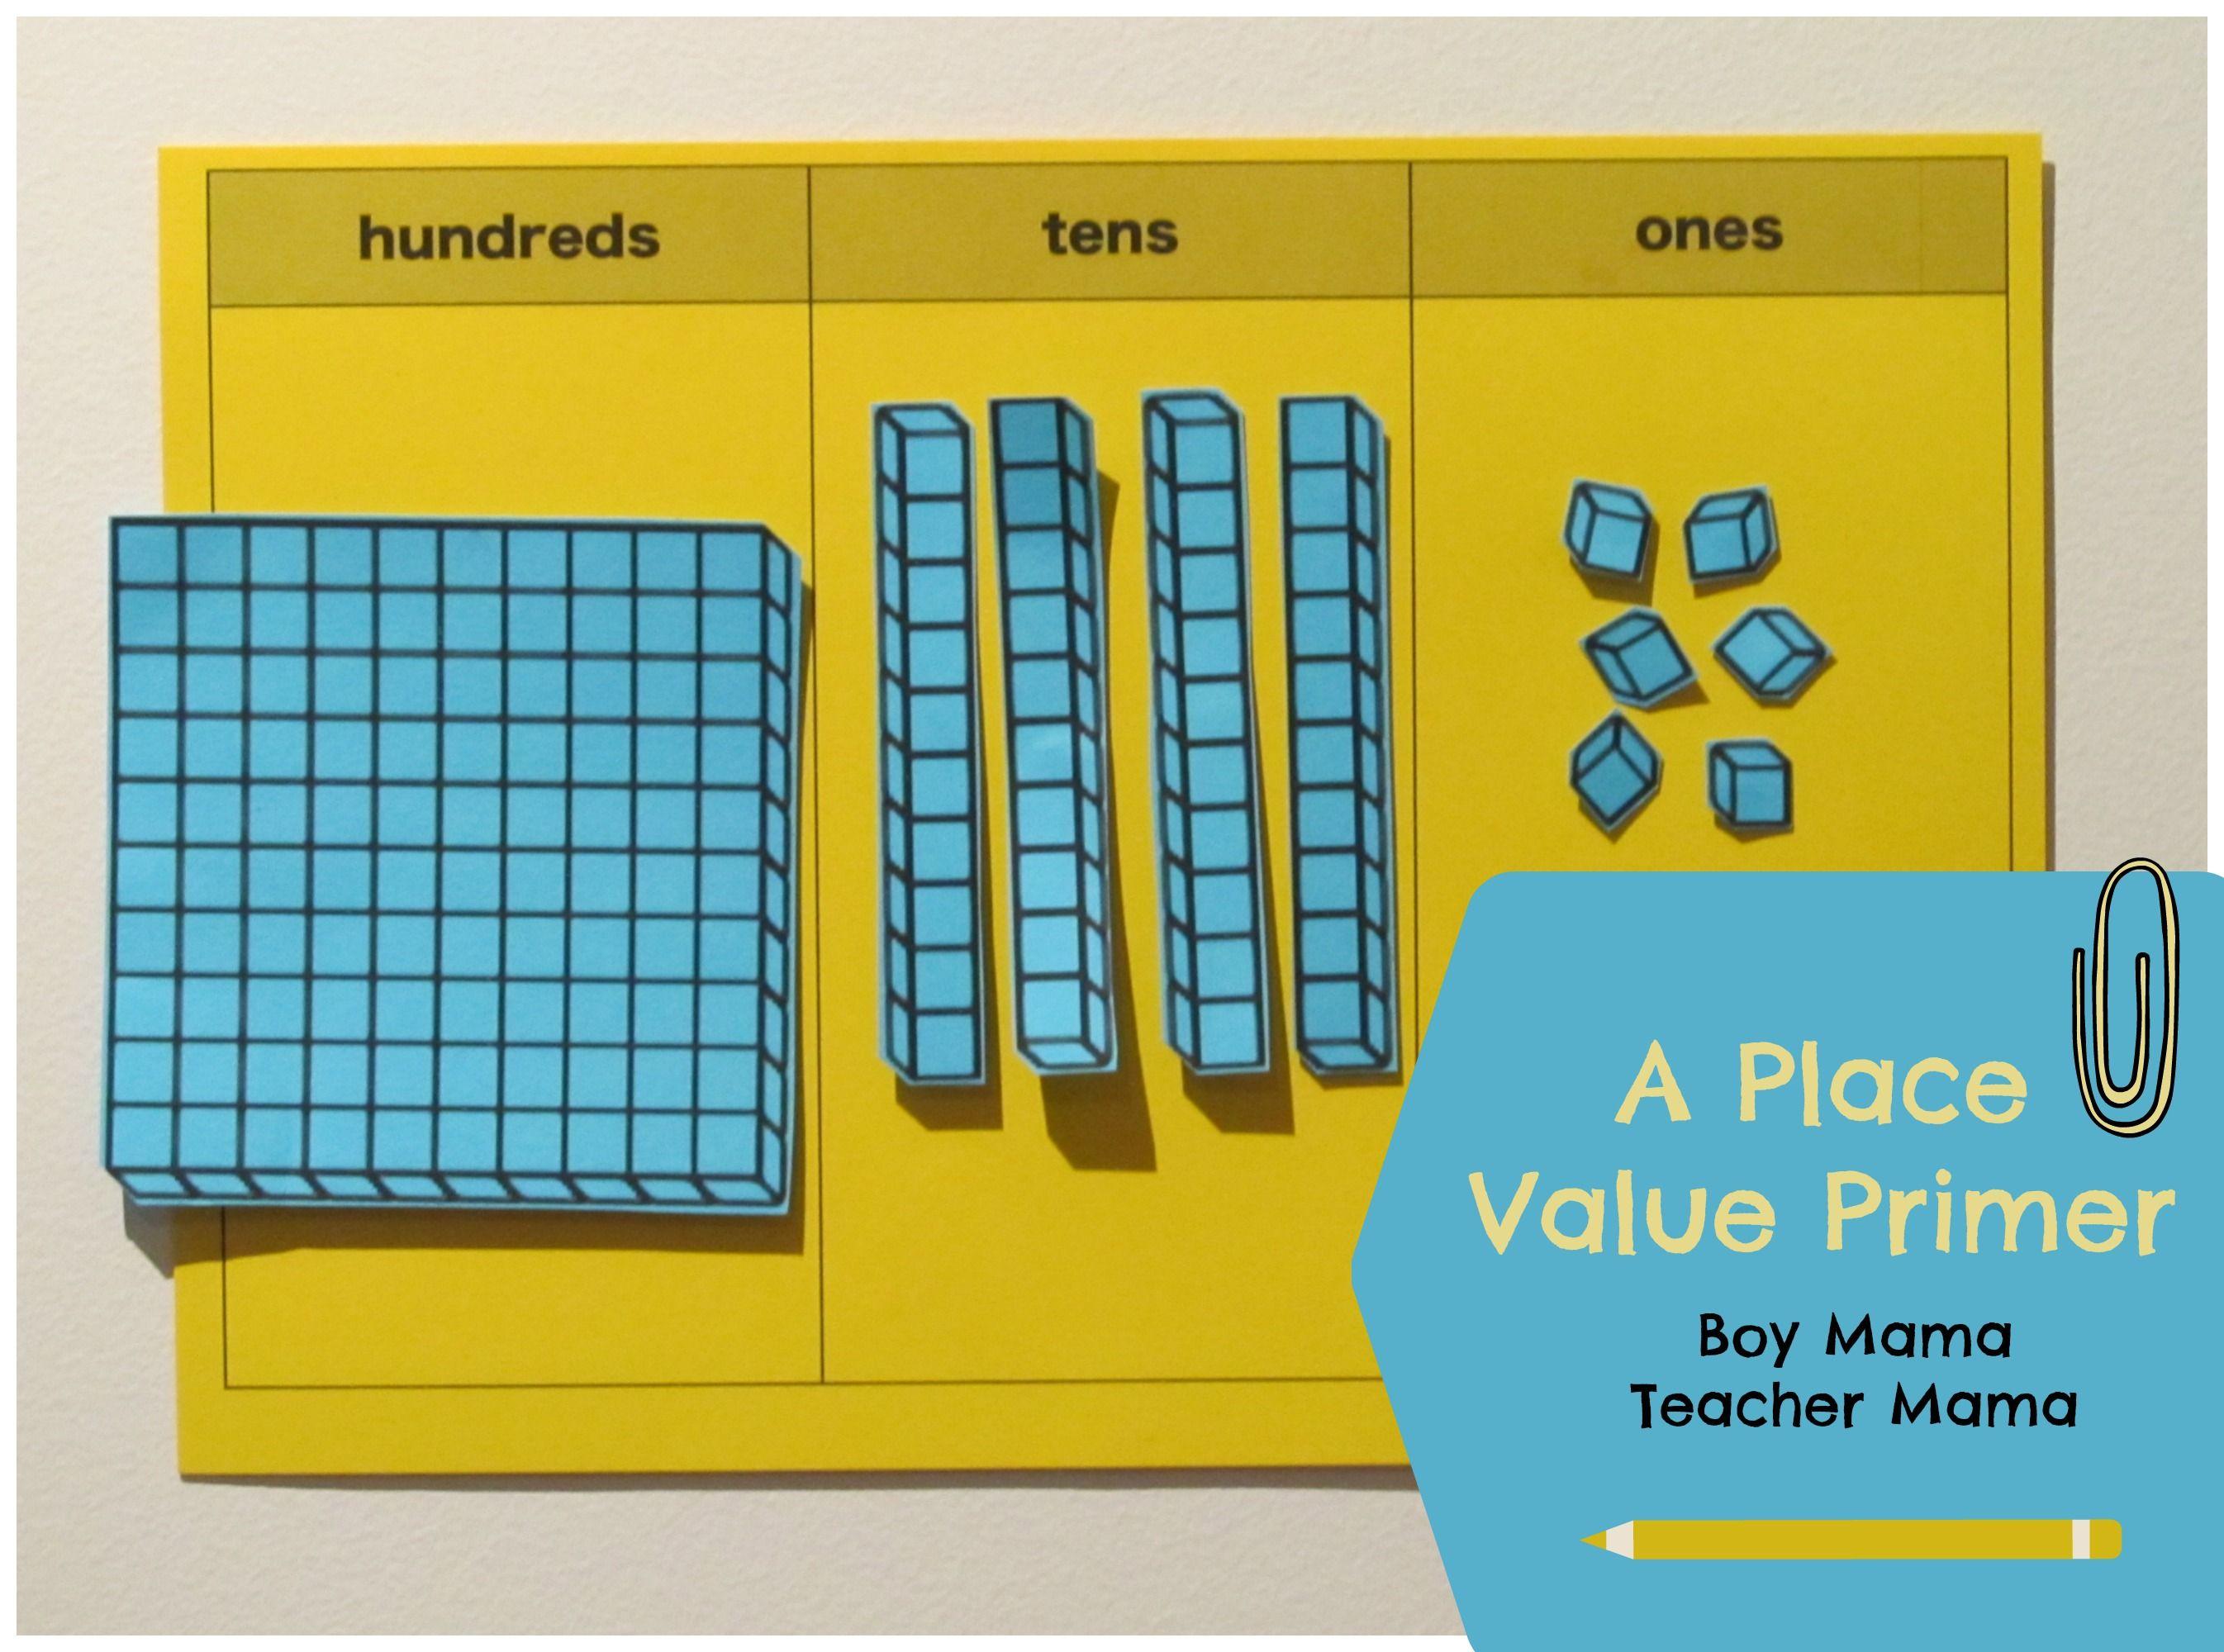 Teacher Mama Place Value Primer